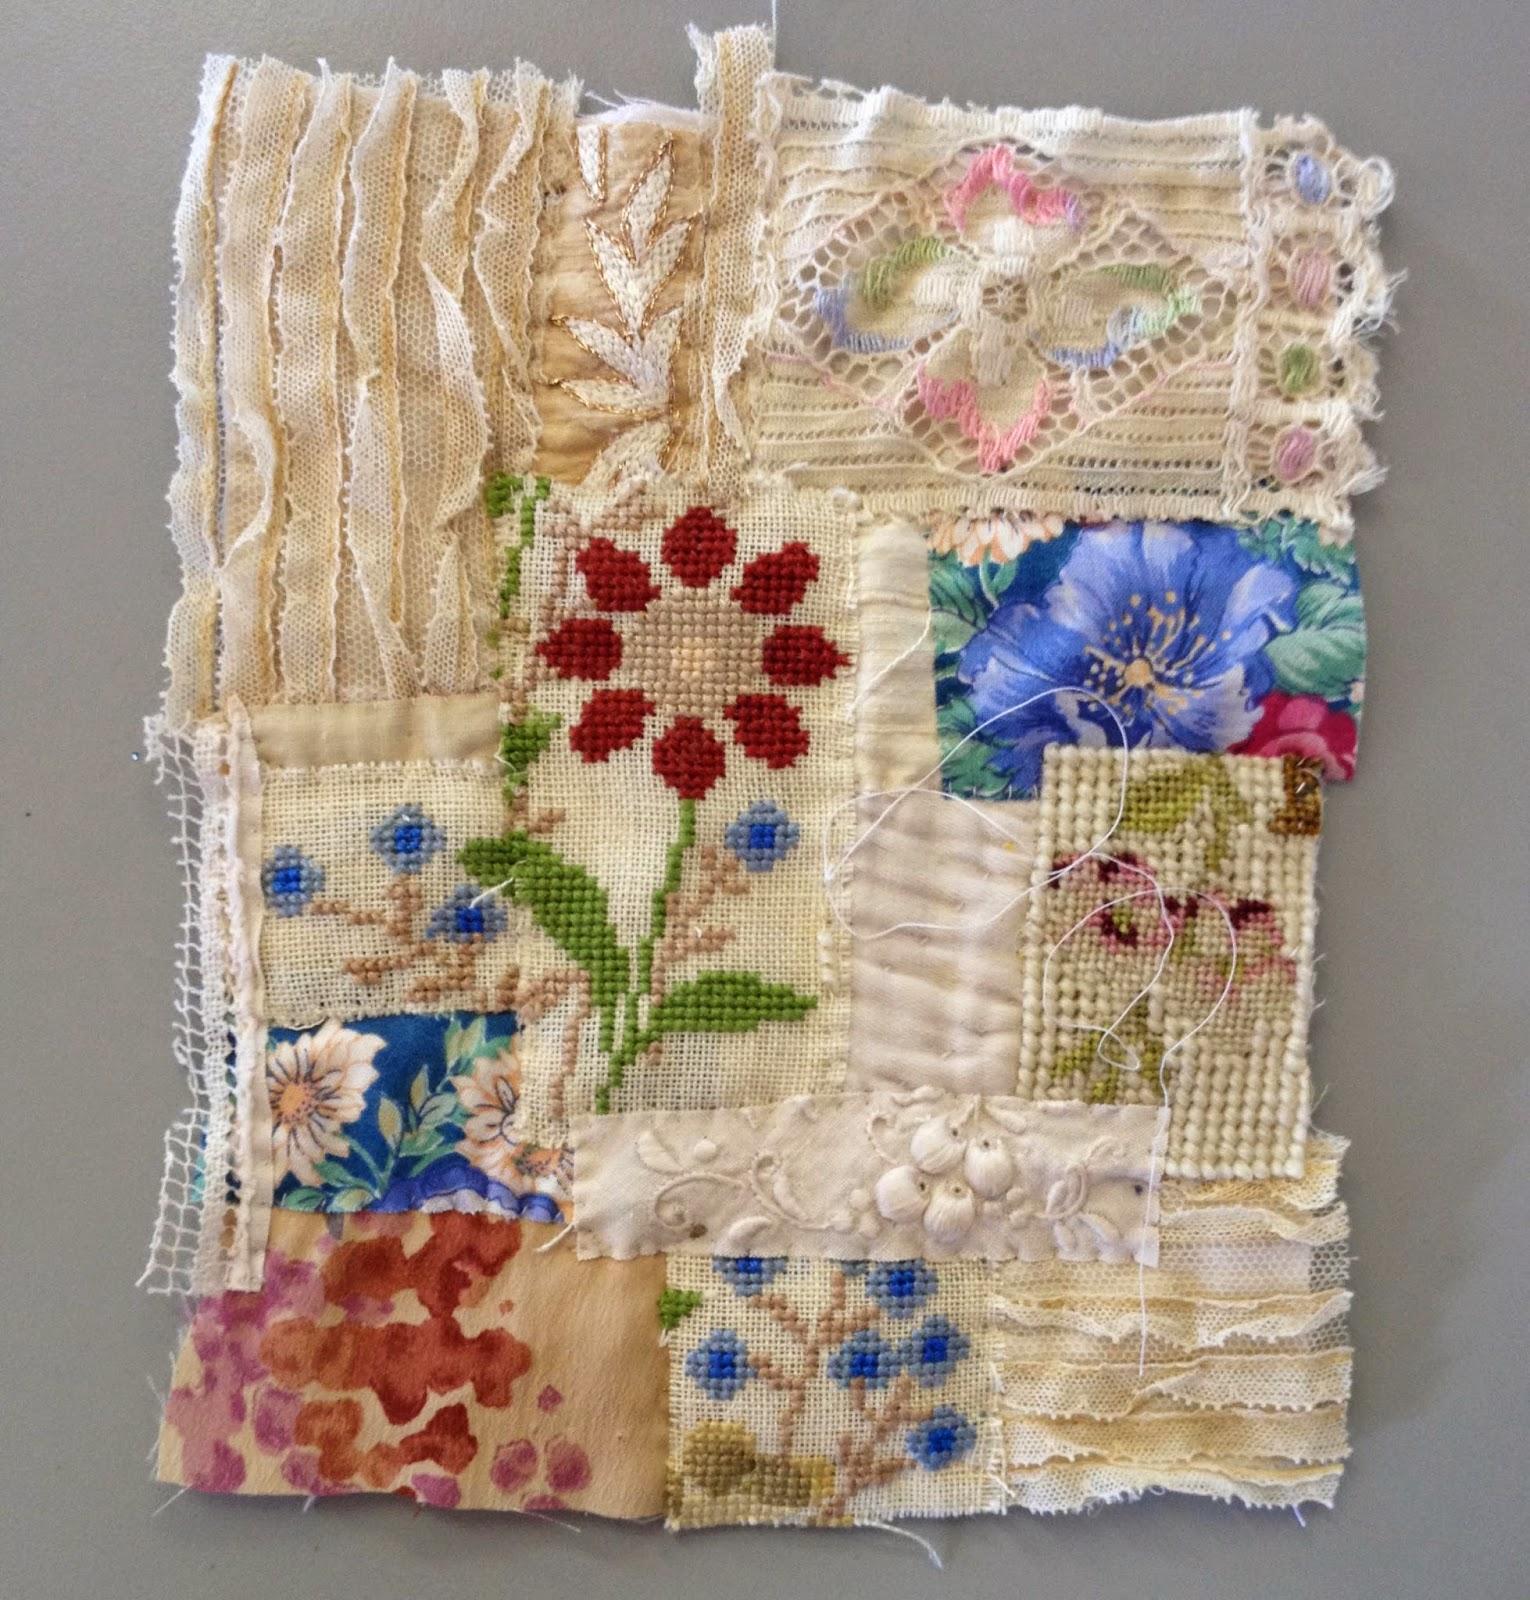 Mandy pattullo on pinterest fabric books collage and